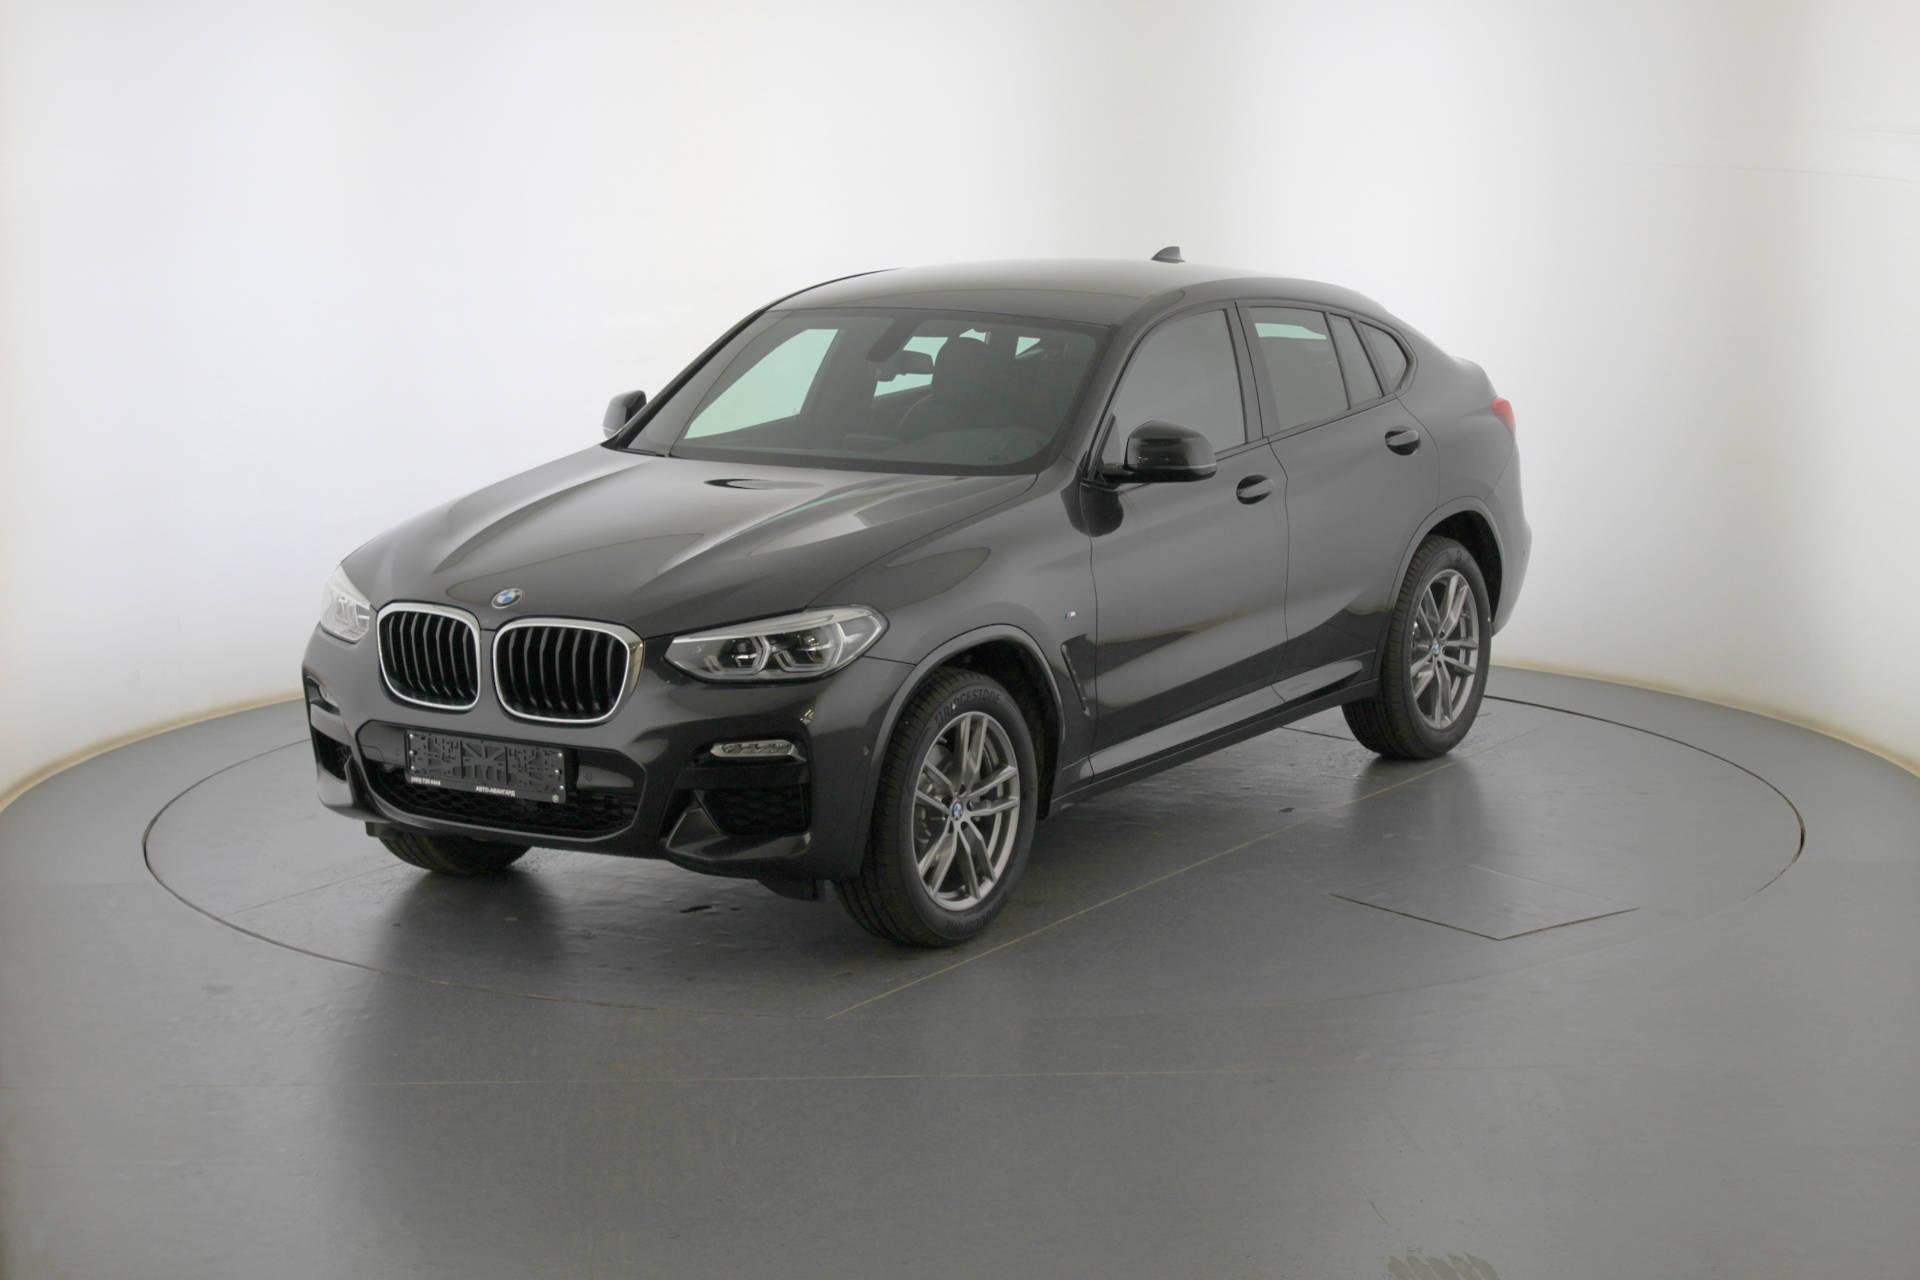 Bmw X4 Xdrive20d M Sport лс 20td190 8at 5w за 3 503 000 руб